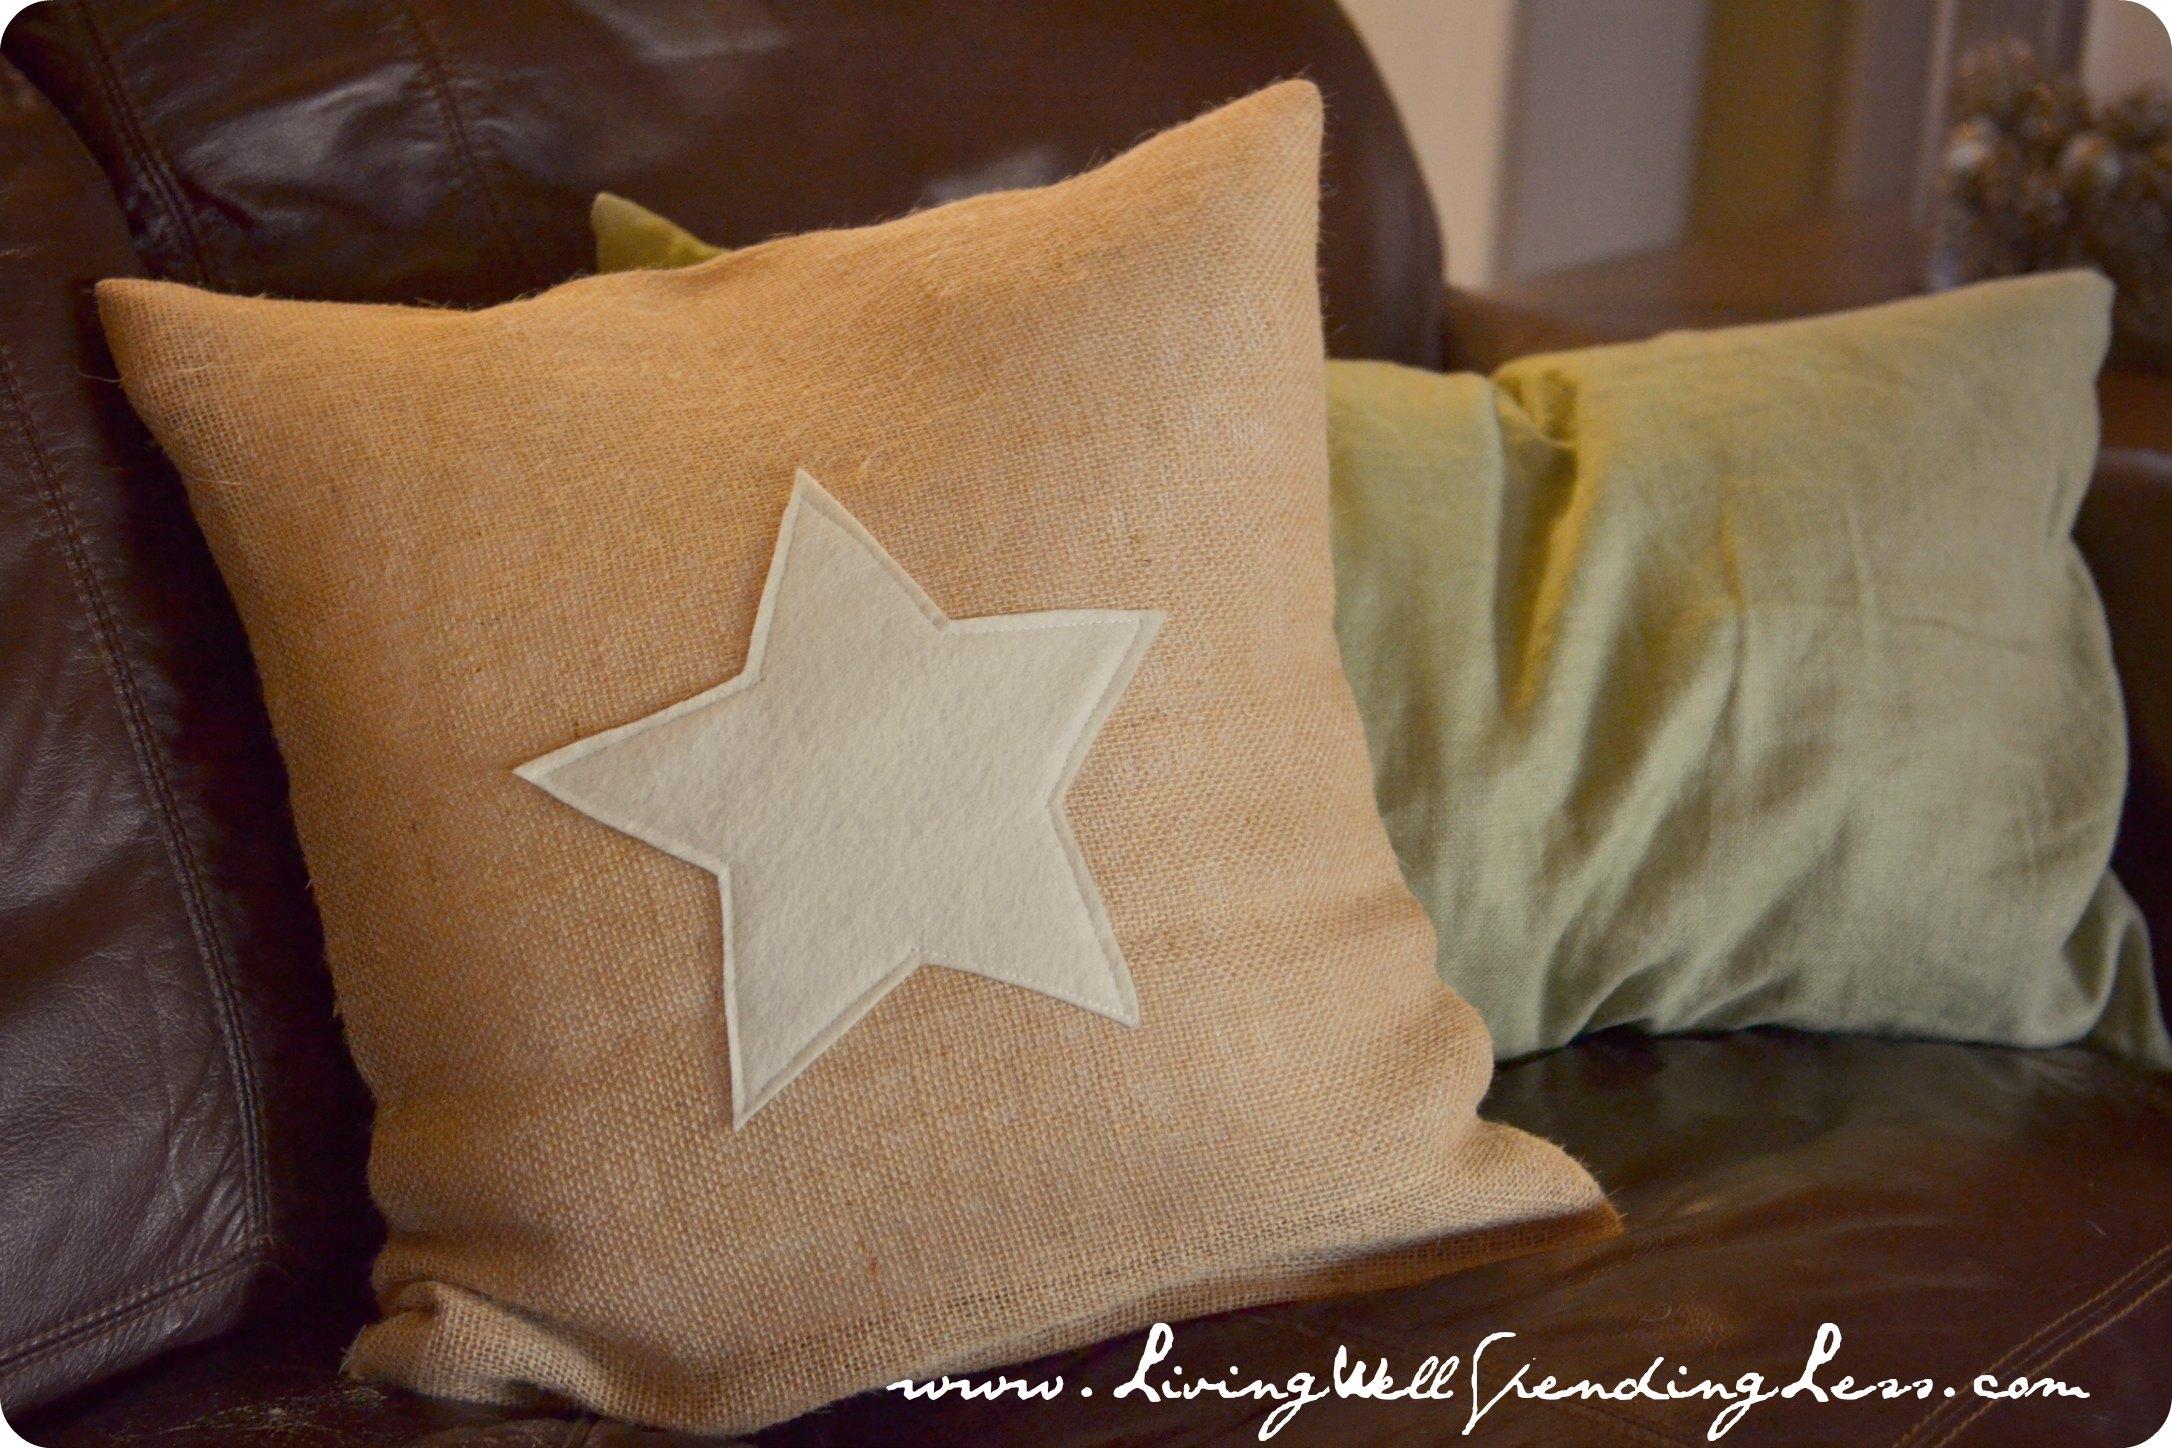 pillow item s day seasonal burlap in home cushion shamrock patrick case from green saint st cover irish linkwell pillowcase decor colour